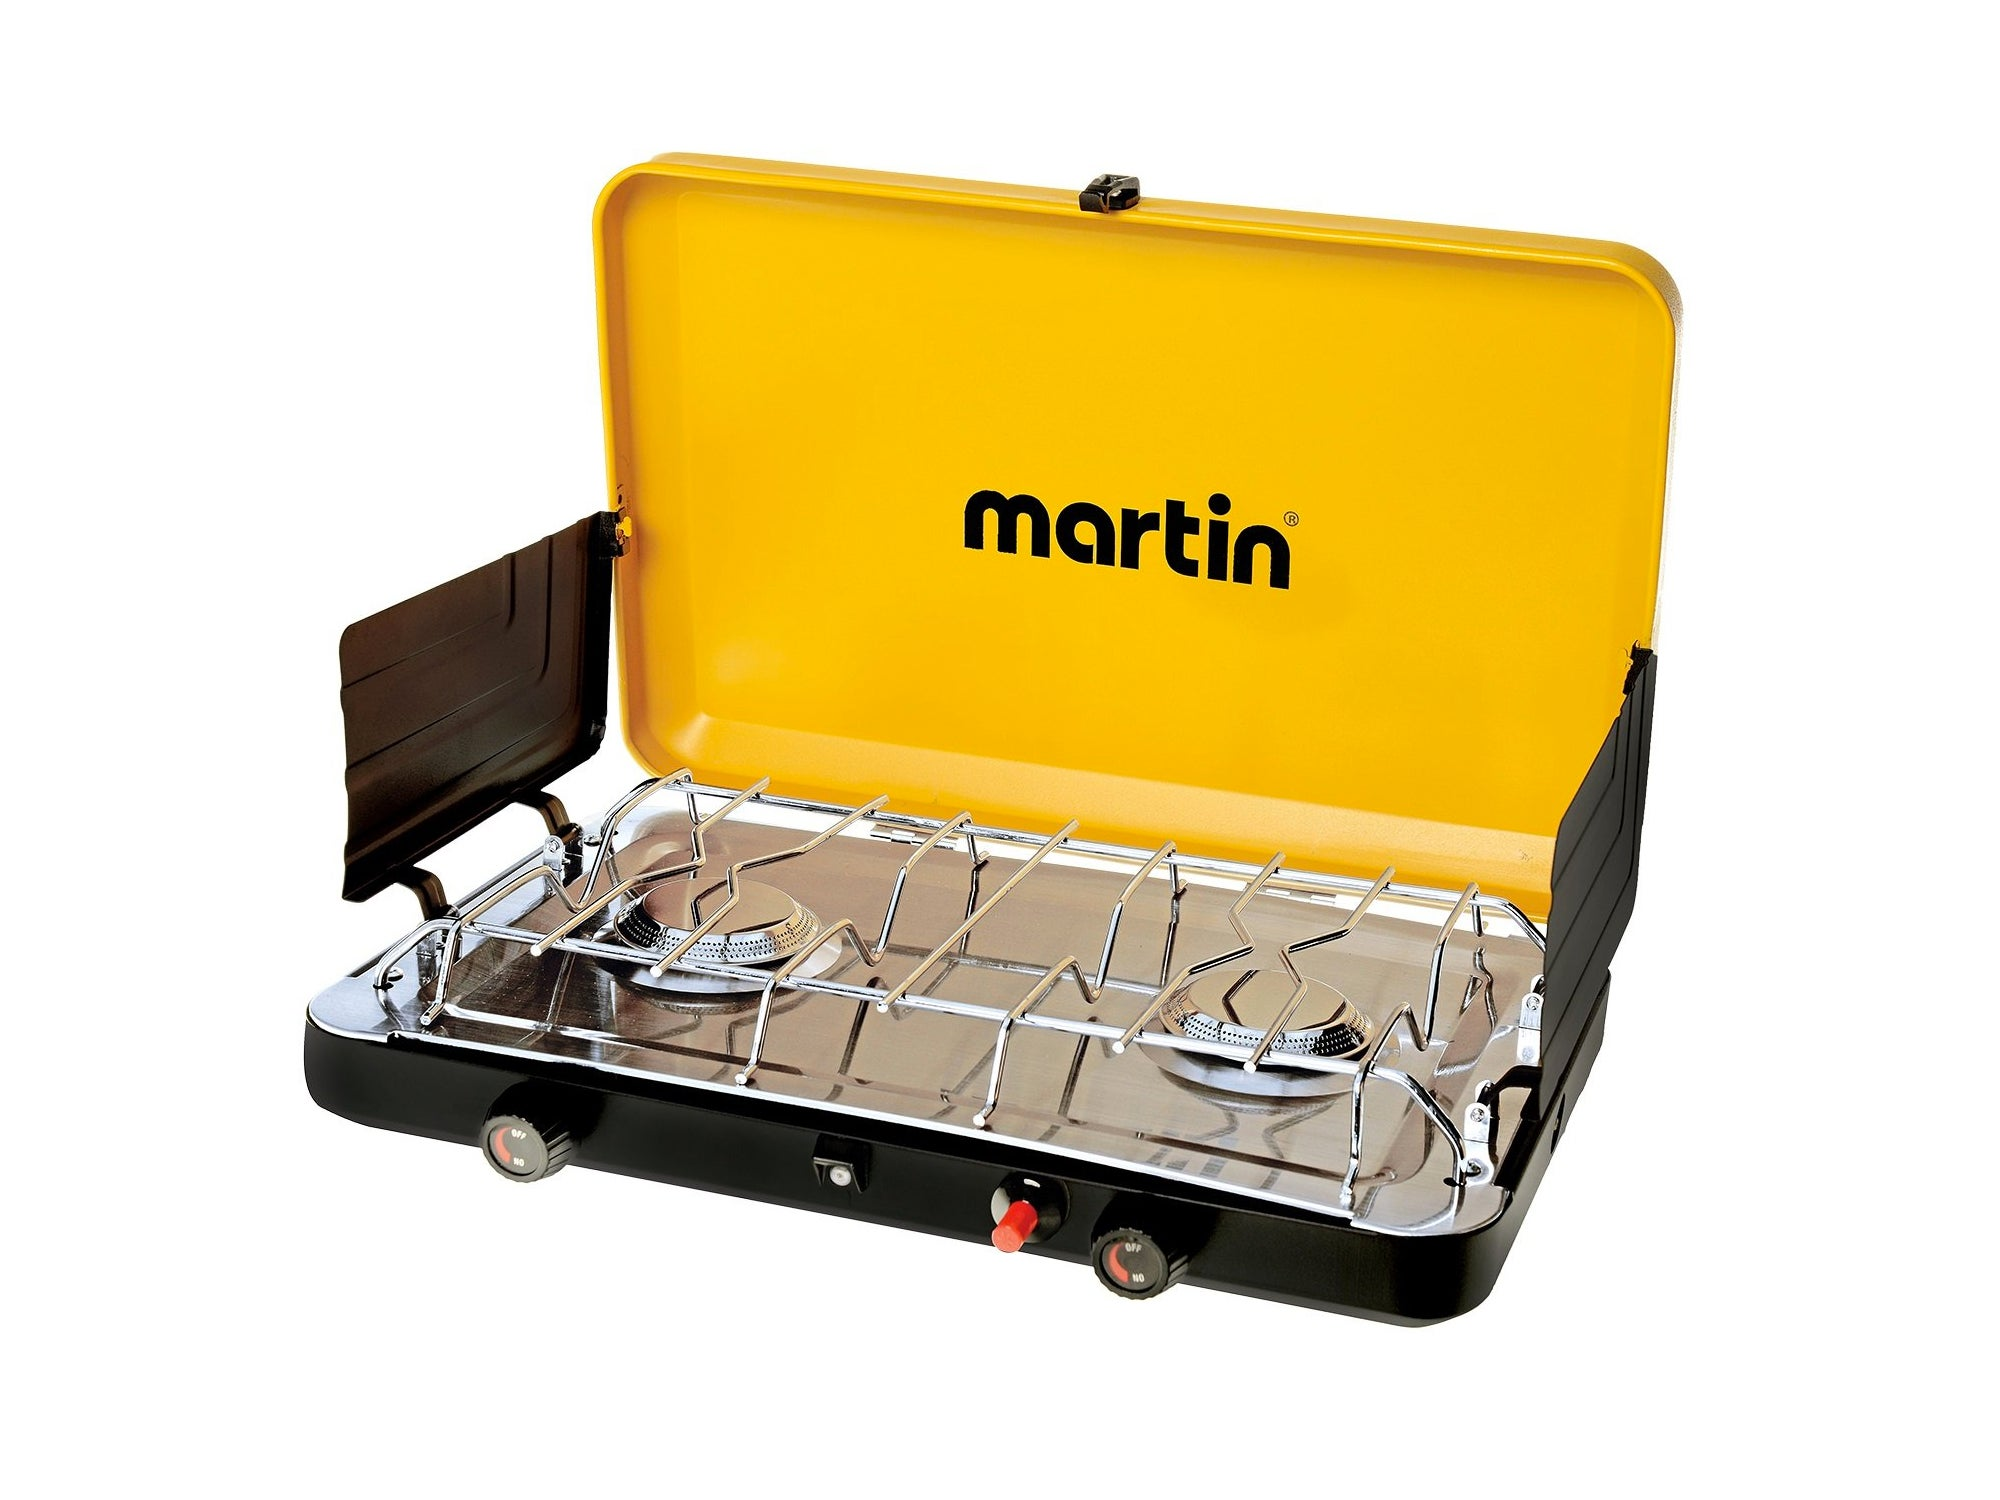 Martin gas burner grill